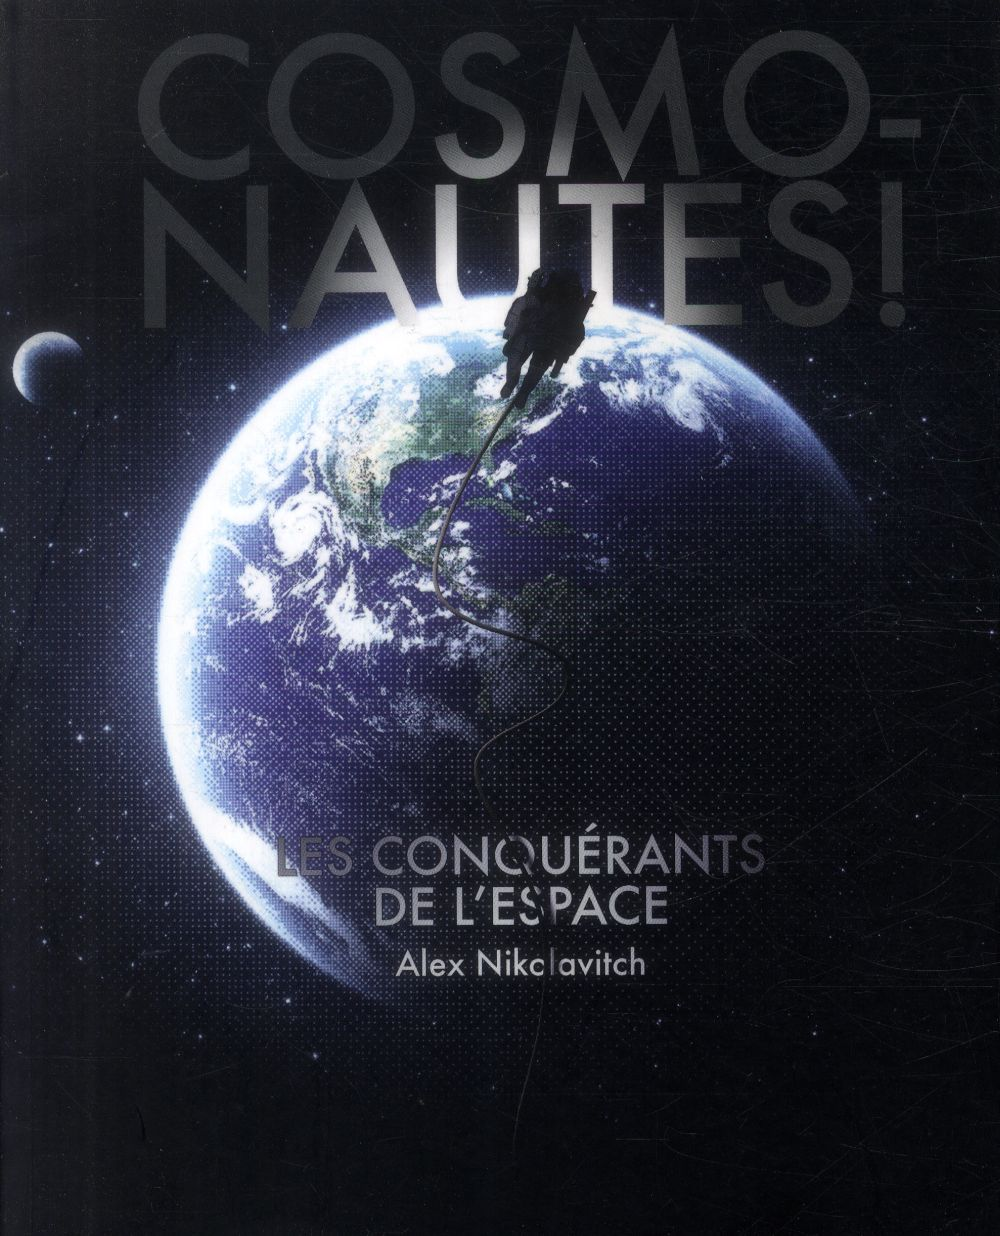 Cosmonautes ! les conquérants de l'espace